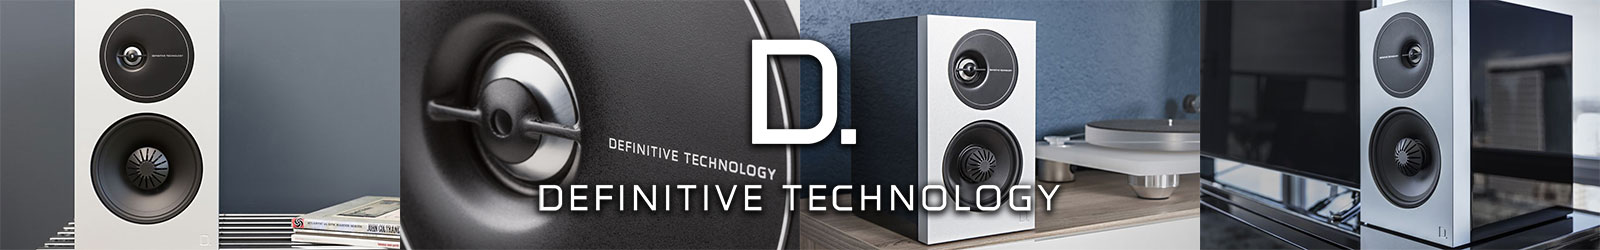 Definitive Technology Banner